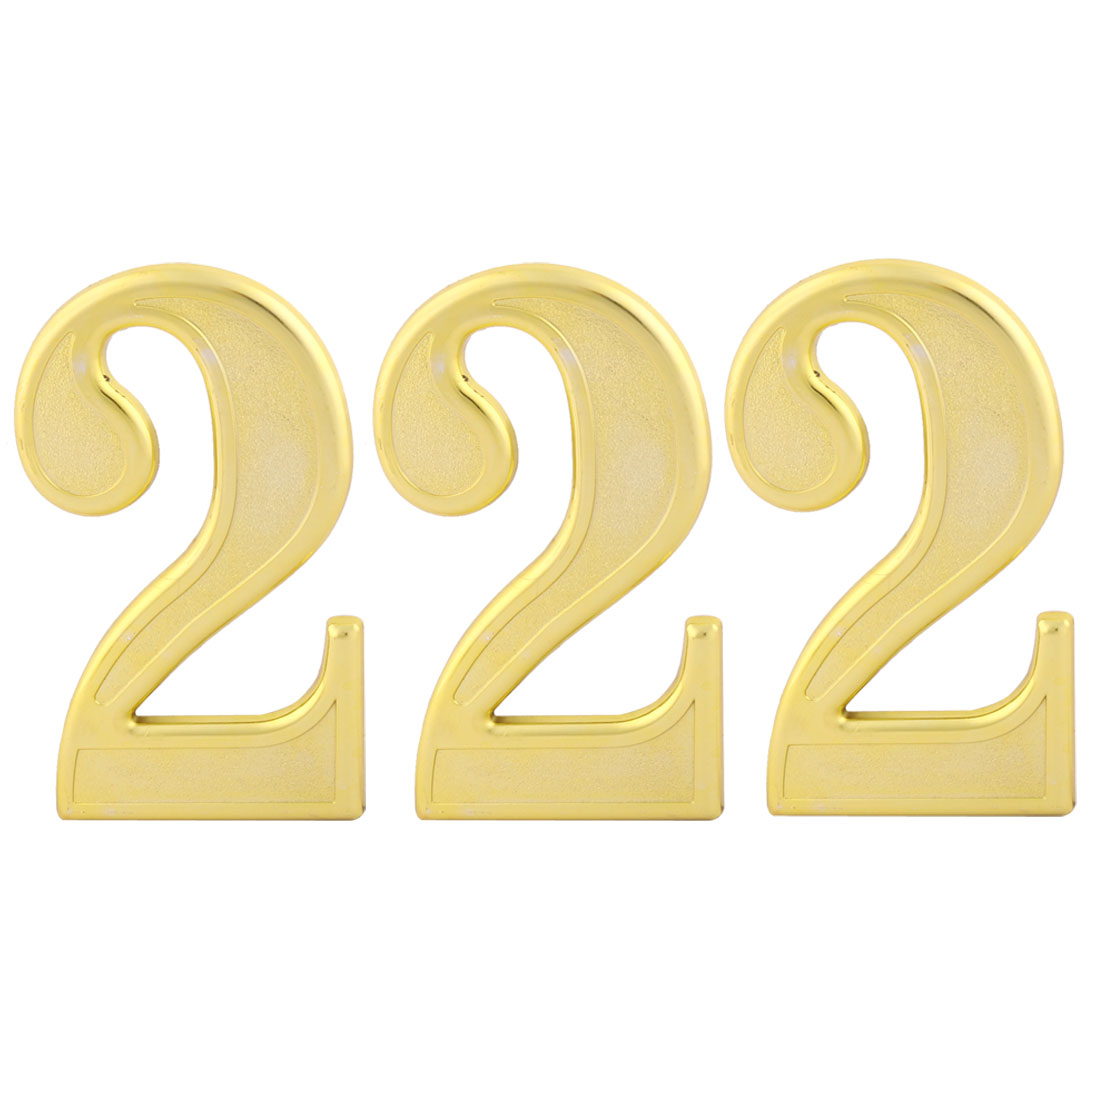 Unique Bargains Address Street Plastic 2 Shaped Plate Number Self Adhesive Stick Sign Label 3pcs